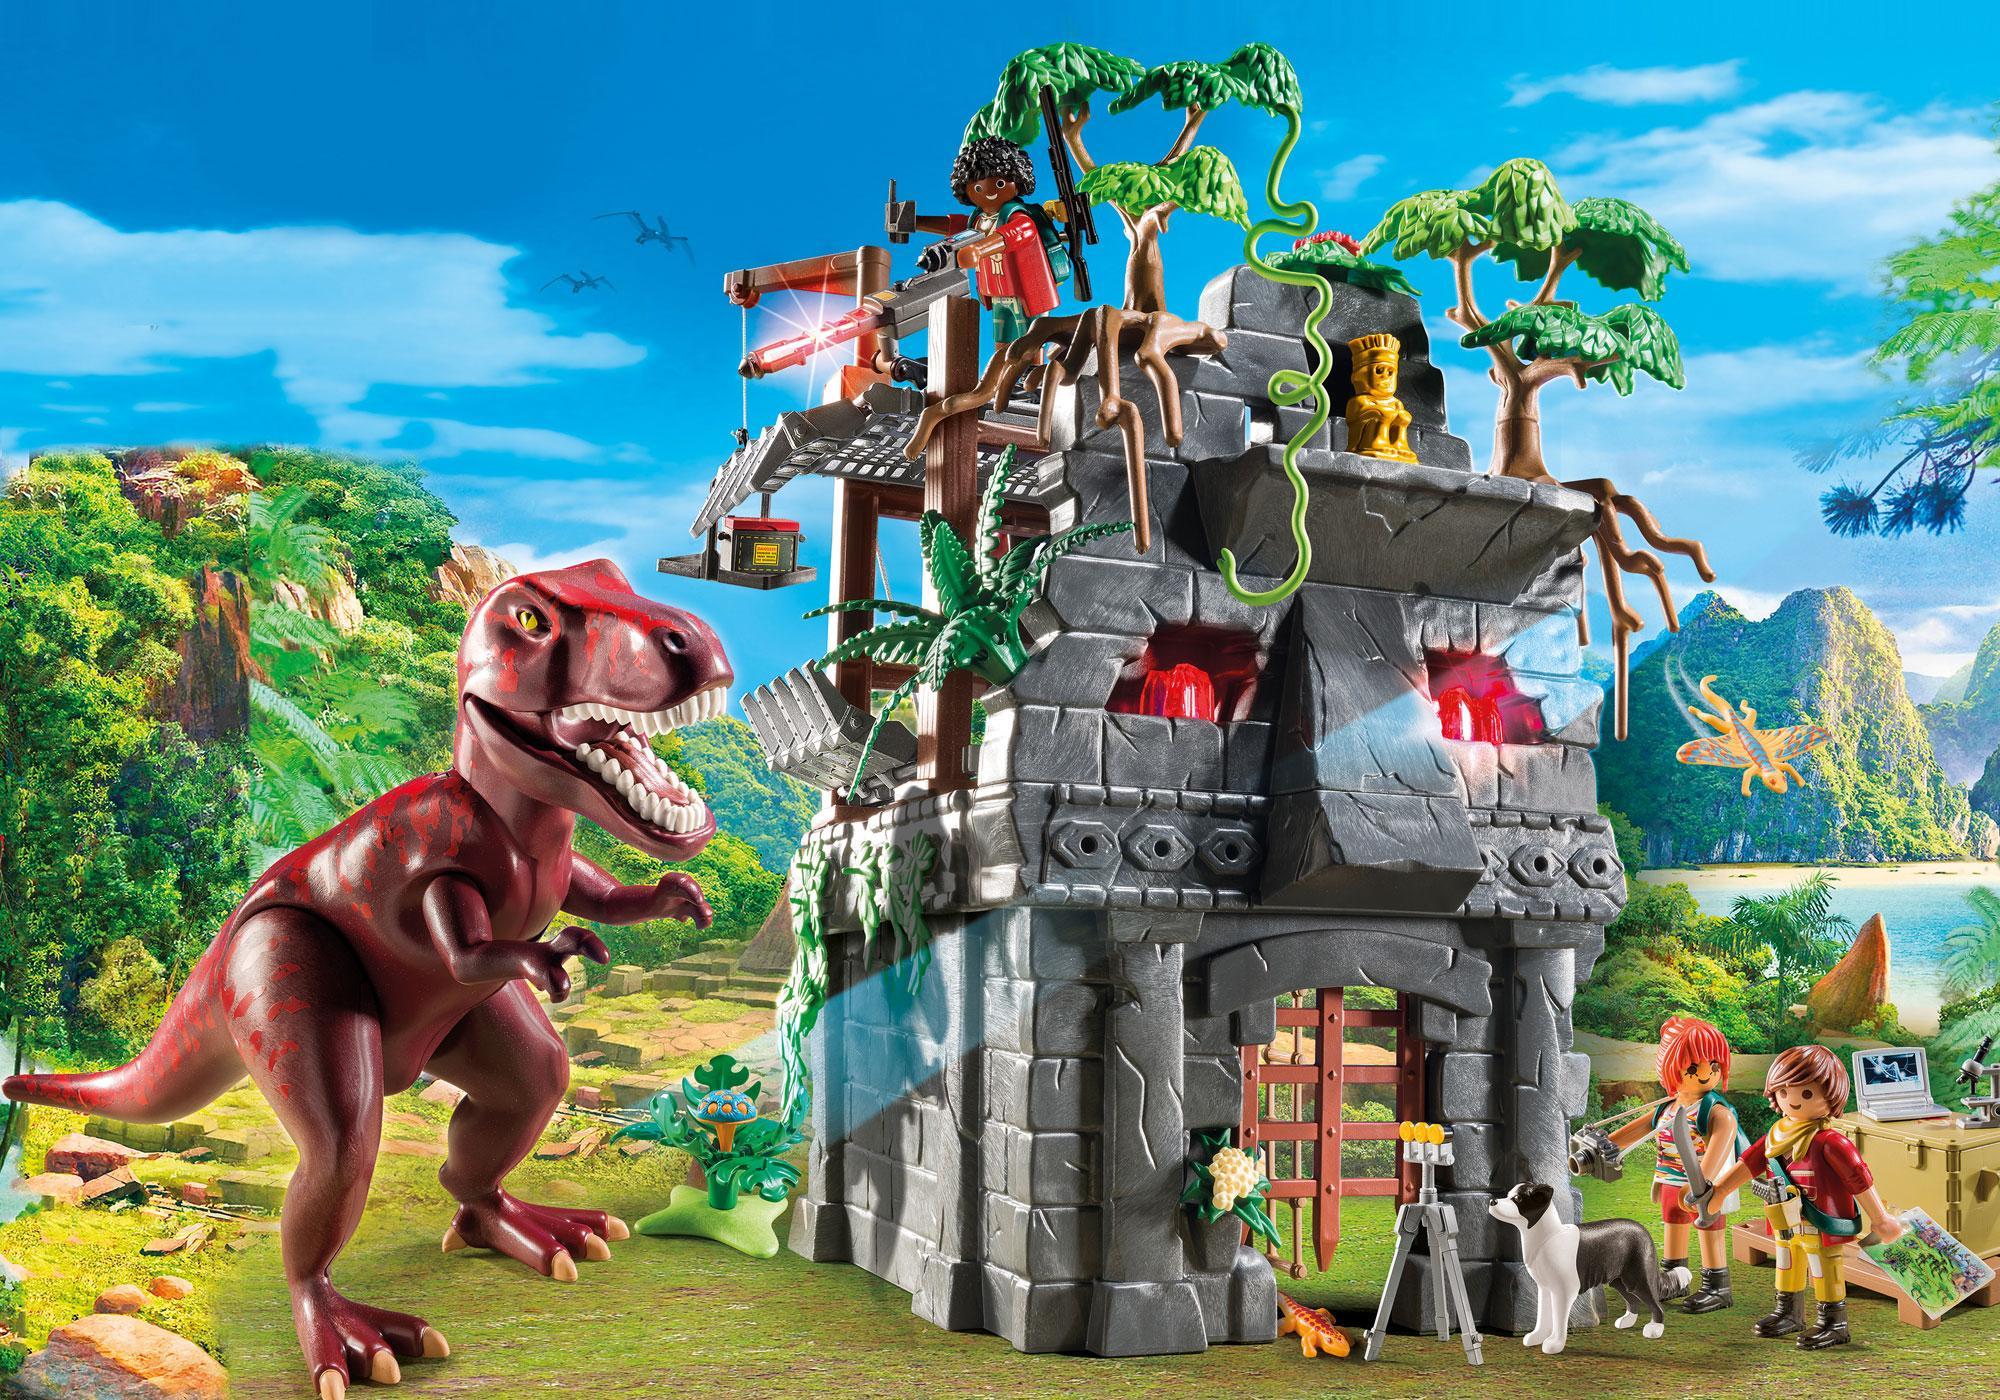 http://media.playmobil.com/i/playmobil/9429_product_detail/Hidden Temple with T-Rex